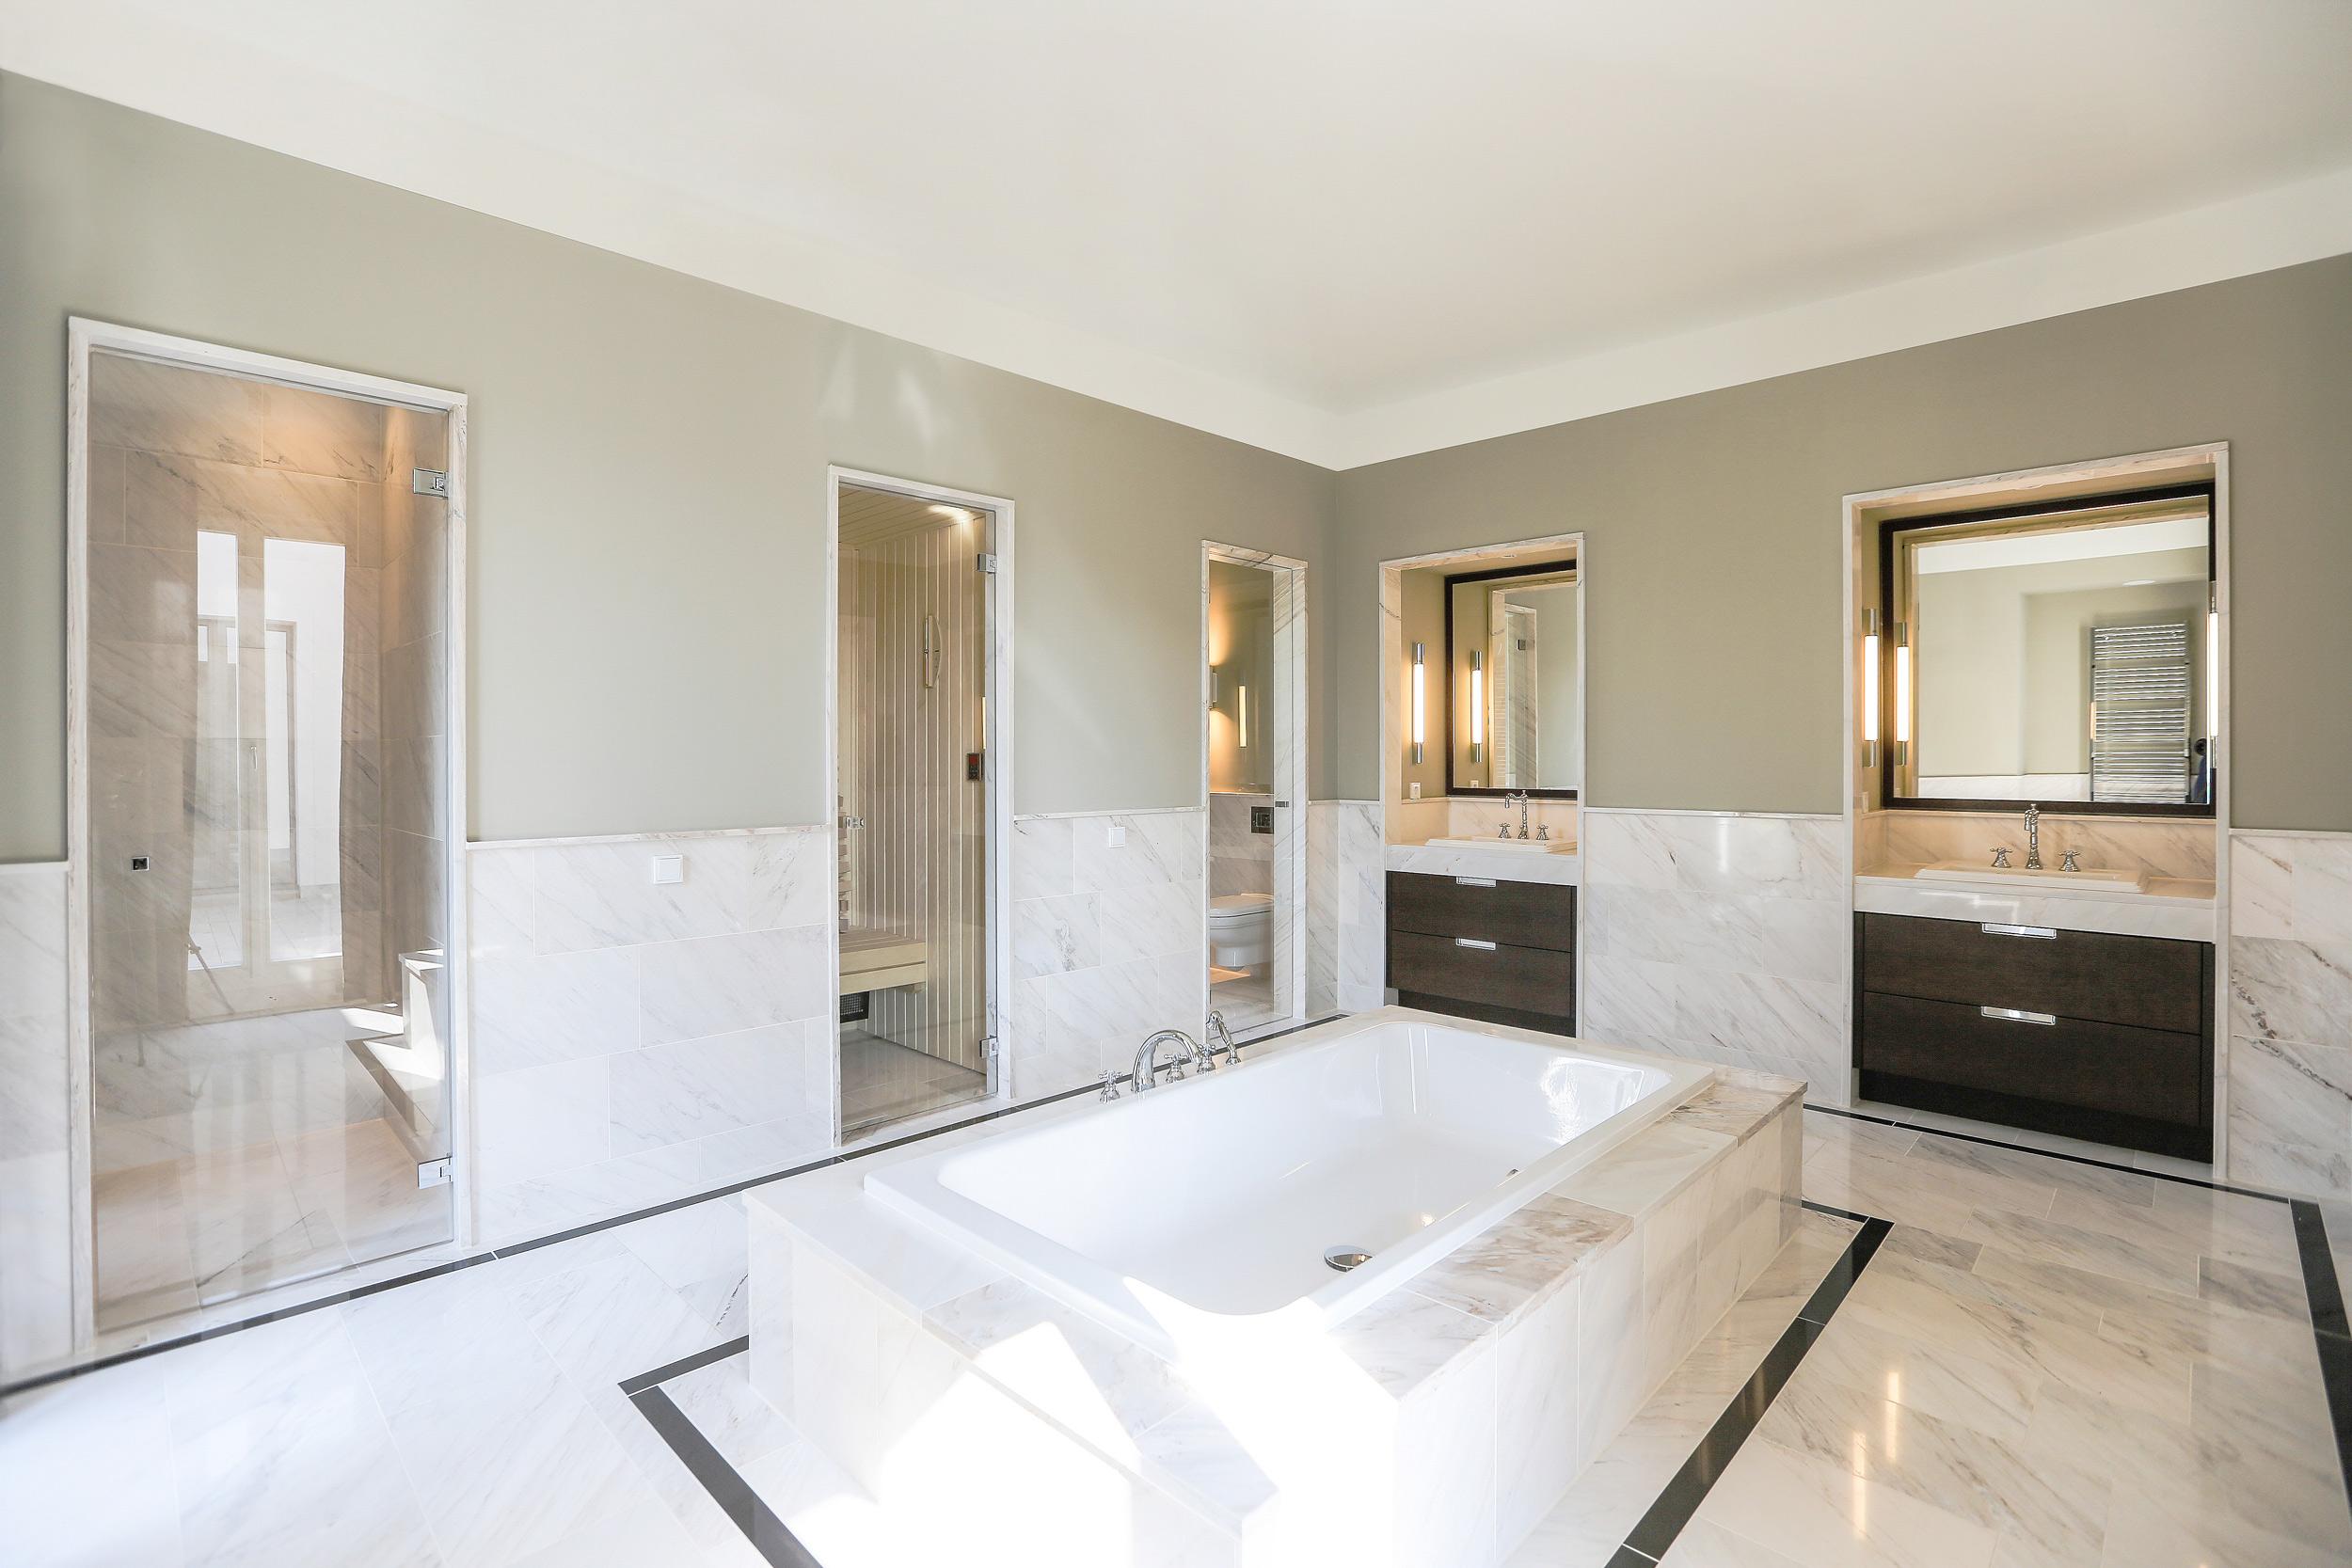 Masterbad Wellness Sauna - Neubau einer Villa im Klassik-Stil in Potsdam